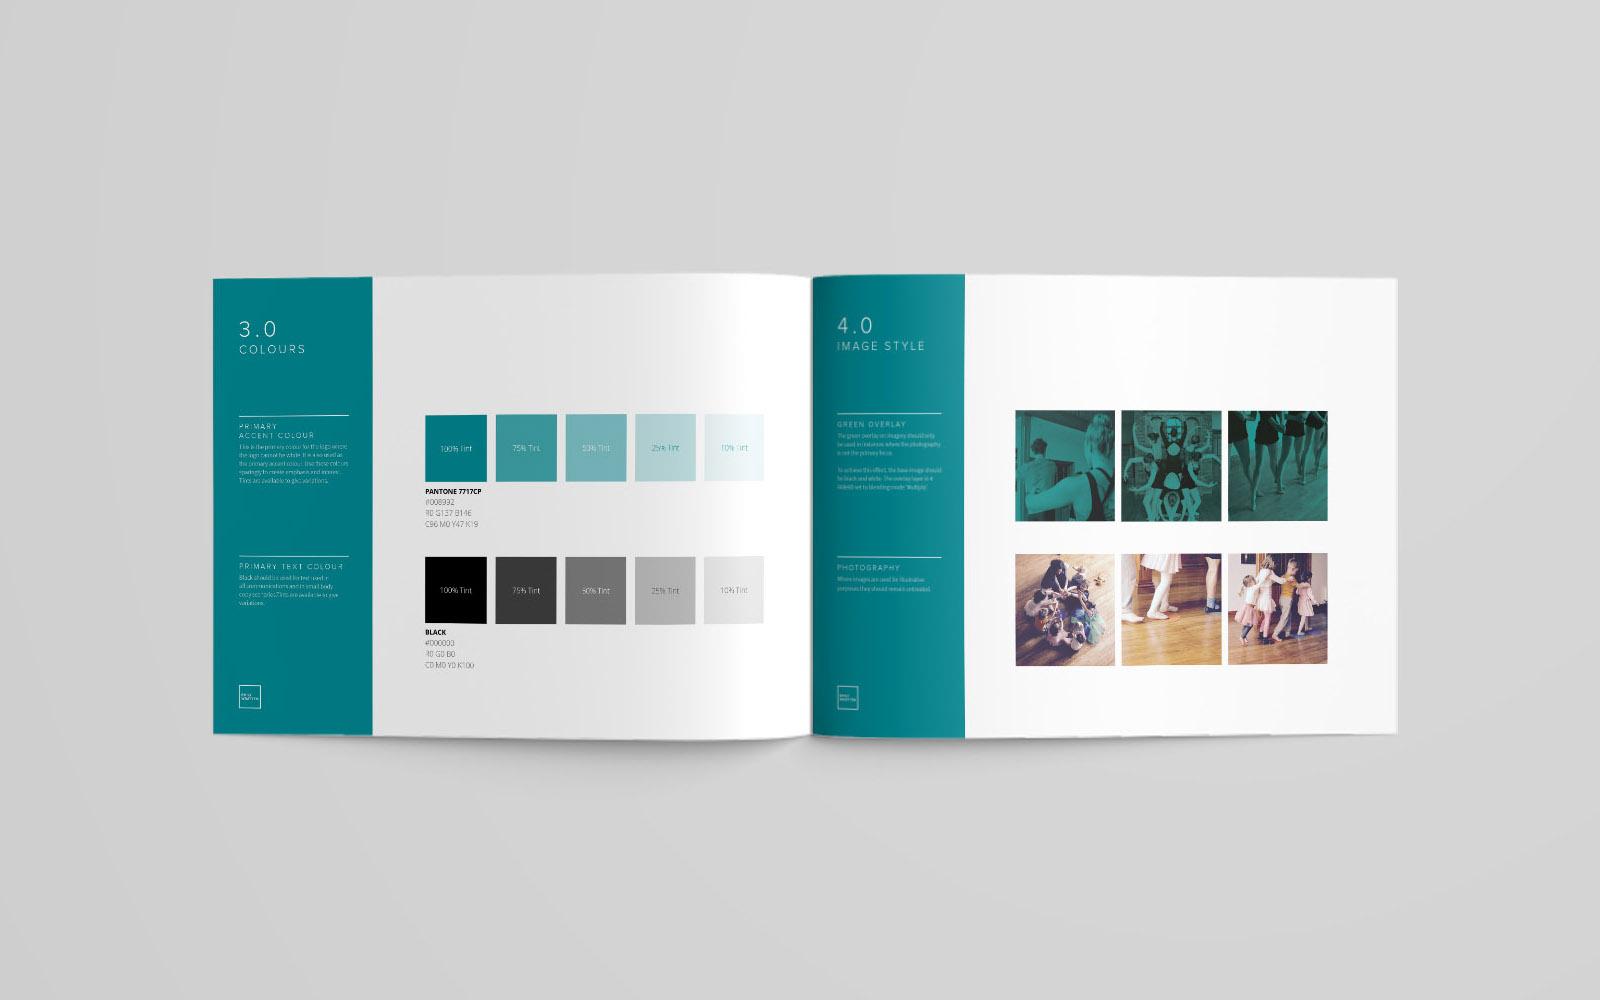 tinybeastdesign-emilywrattendancefitness-guidesline2